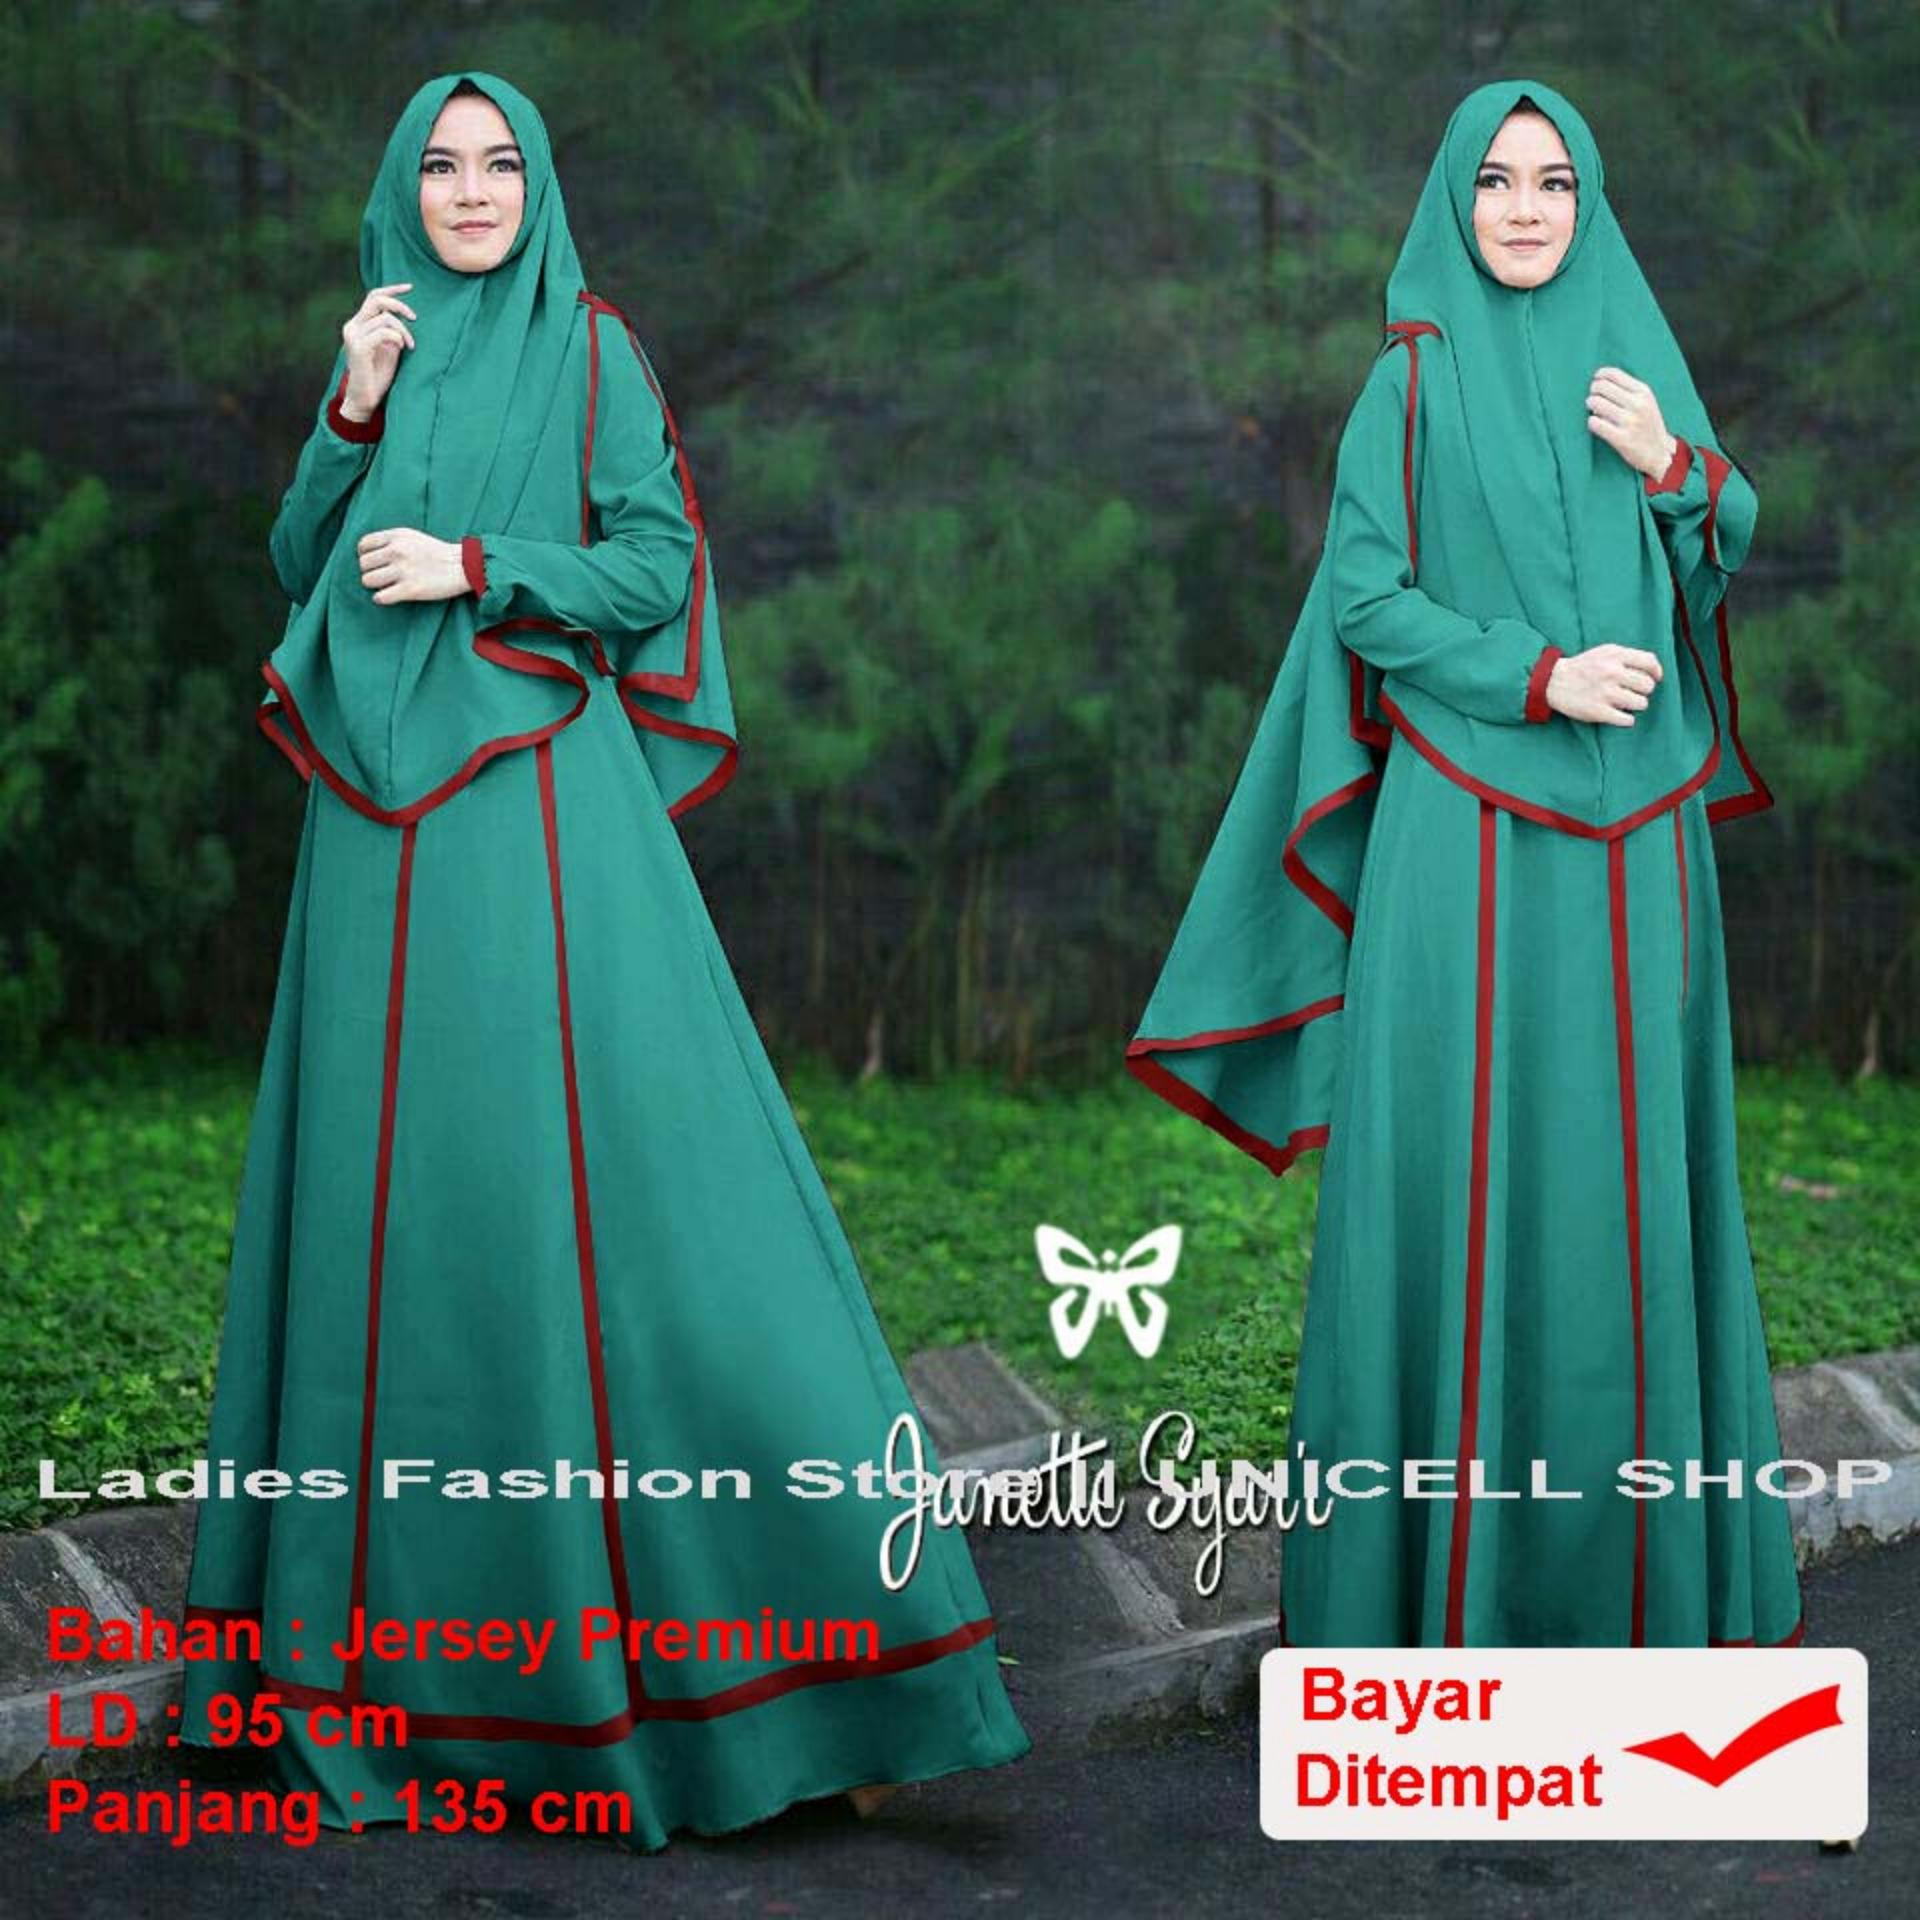 UC Dress Gamis Muslim Imelda / Gamis Muslim Syari Syar'i Fashion Maxi / Syari Simple Elegant / Baju Muslim Wanita Lebaran 2018 (nettaja) SS - Tosca